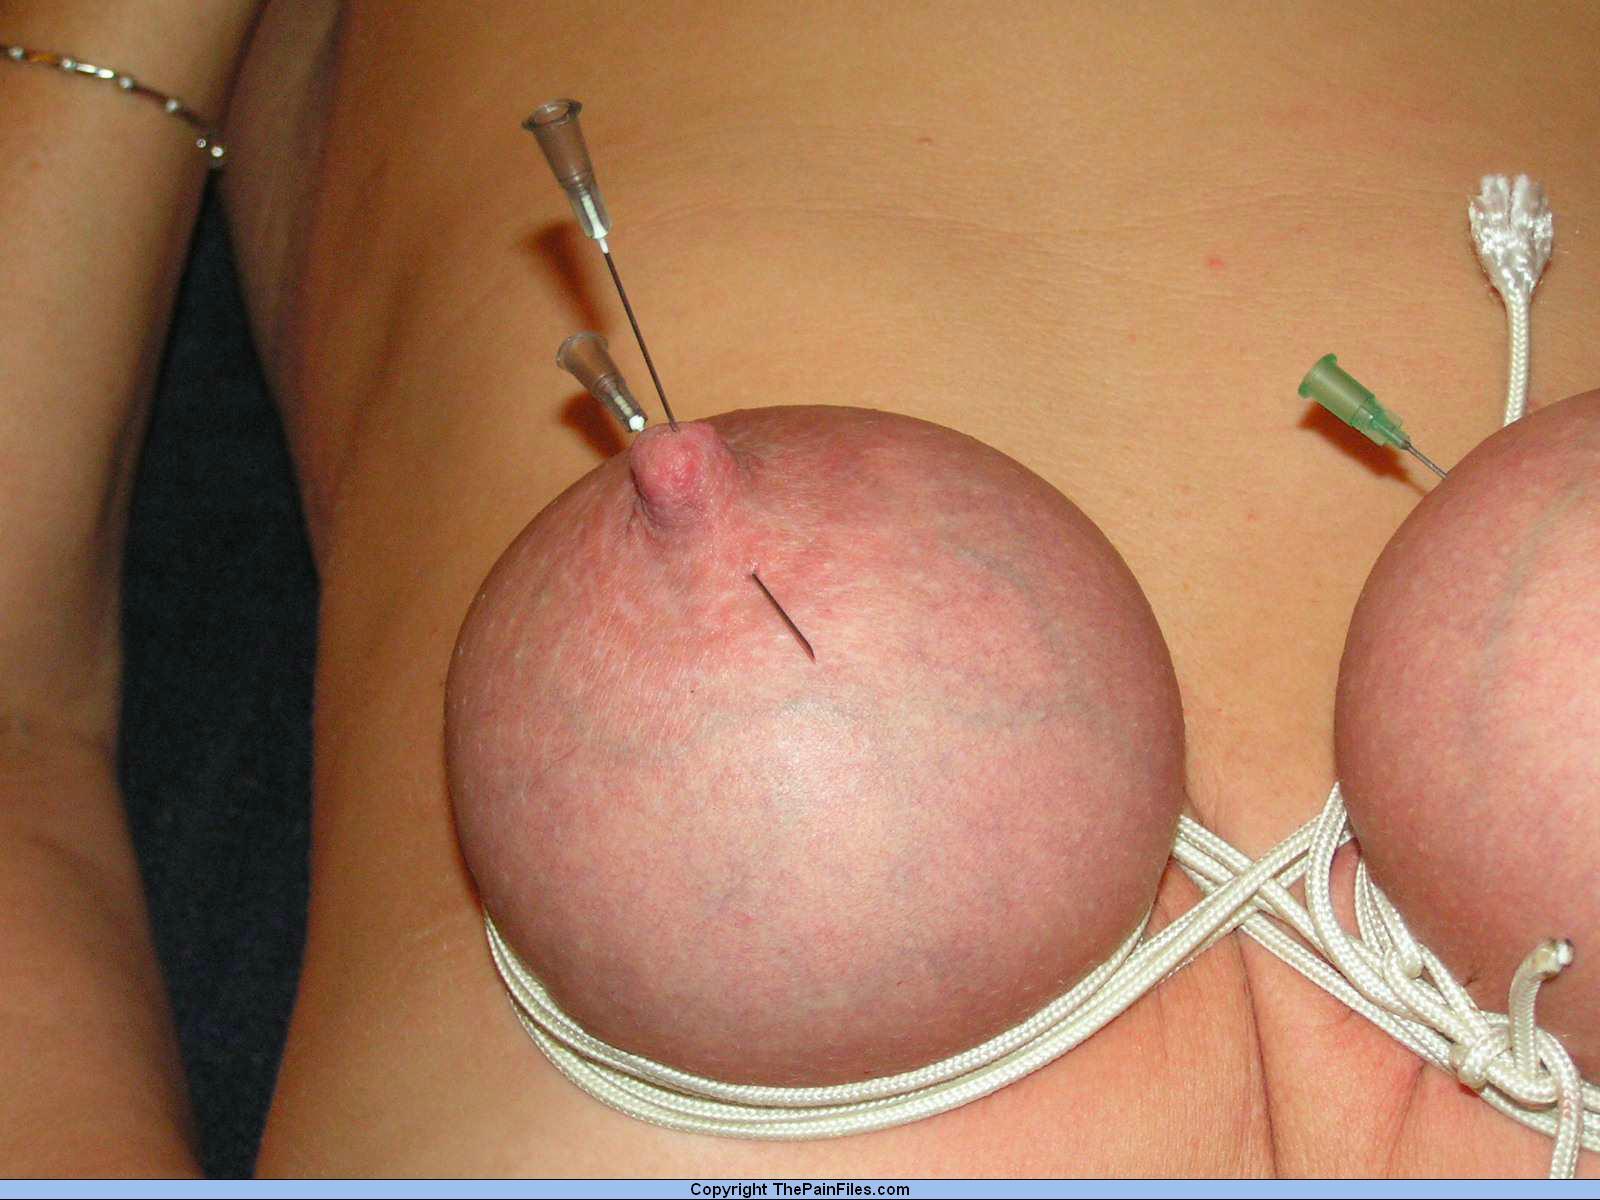 Bdsm nipple needle torture